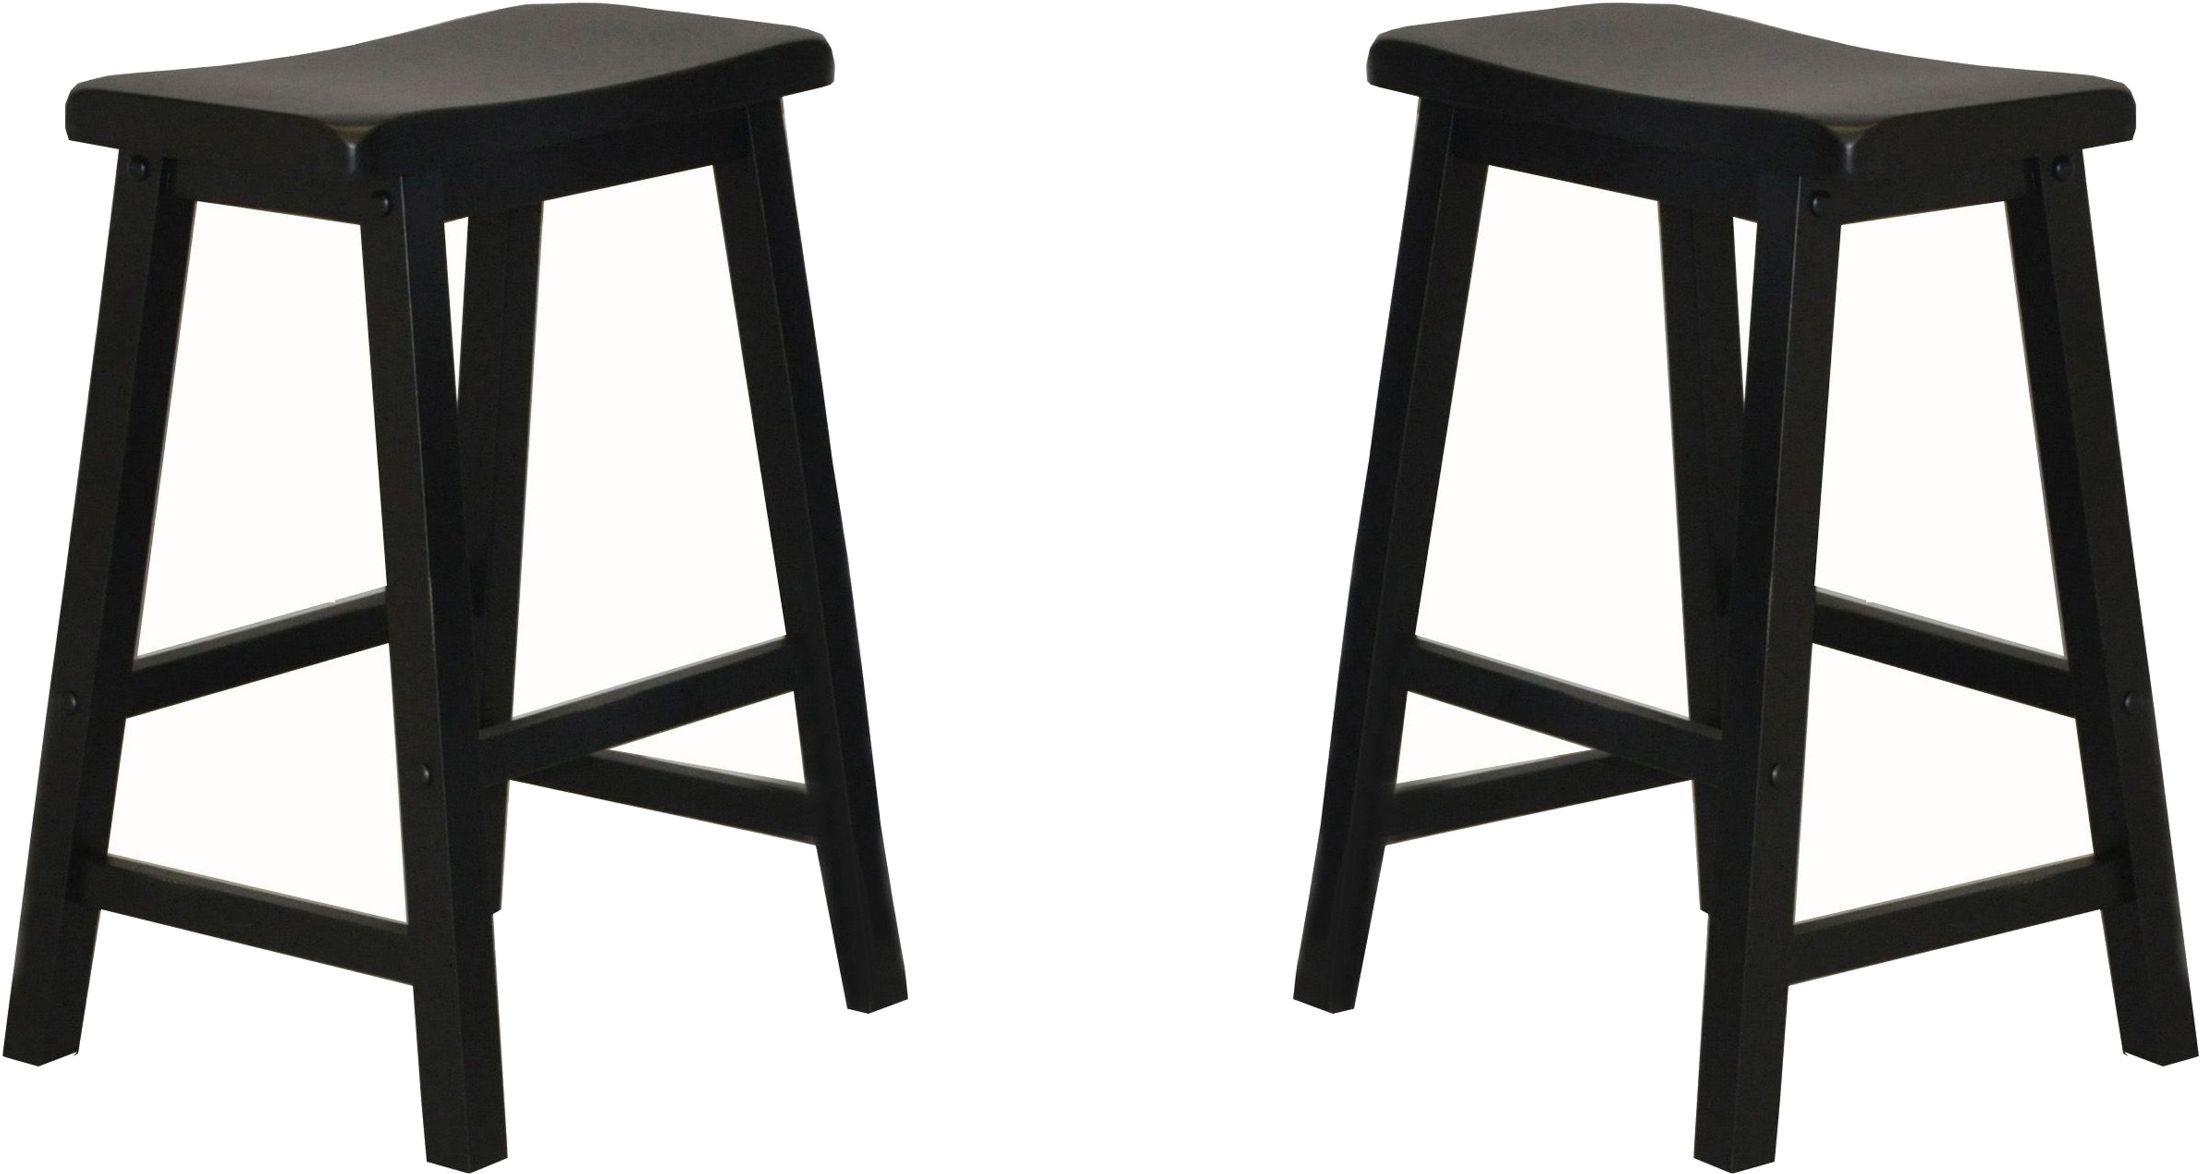 24 Quot Black Saddle Stool Set Of 2 From Eci Furniture